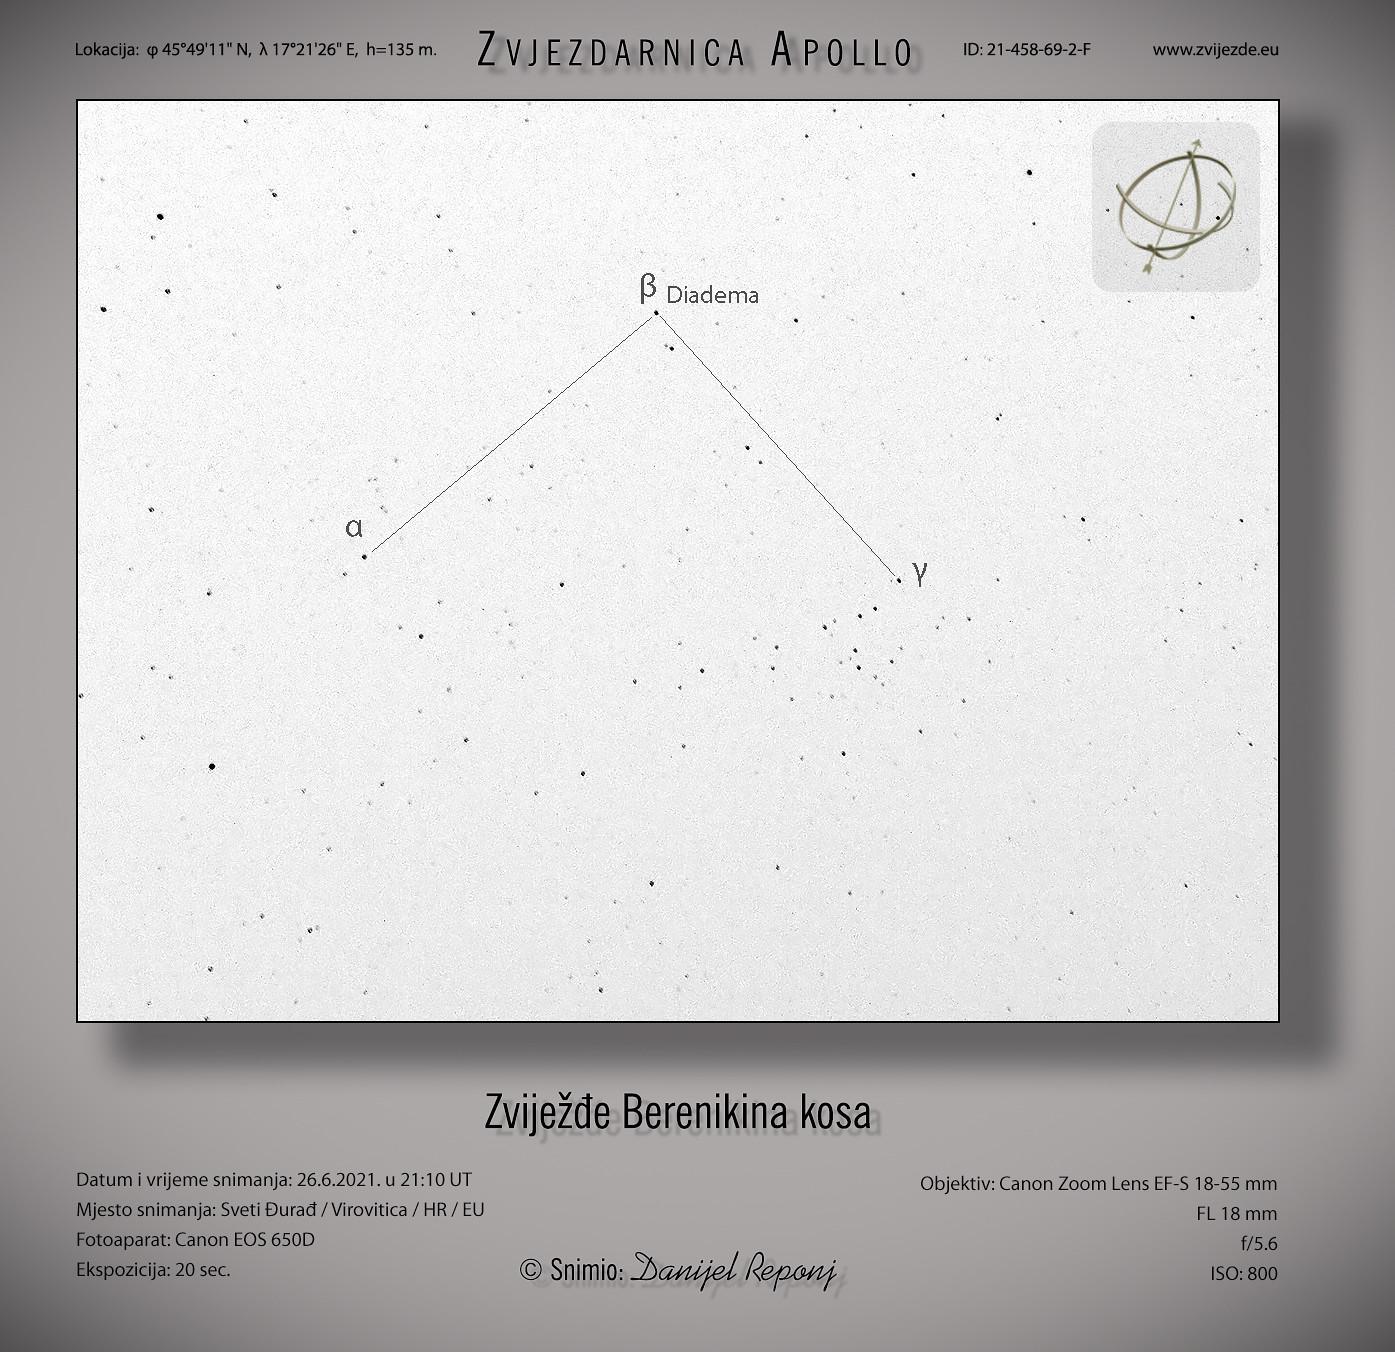 Zviježđe Berenikin kosa, 26.6.2021.